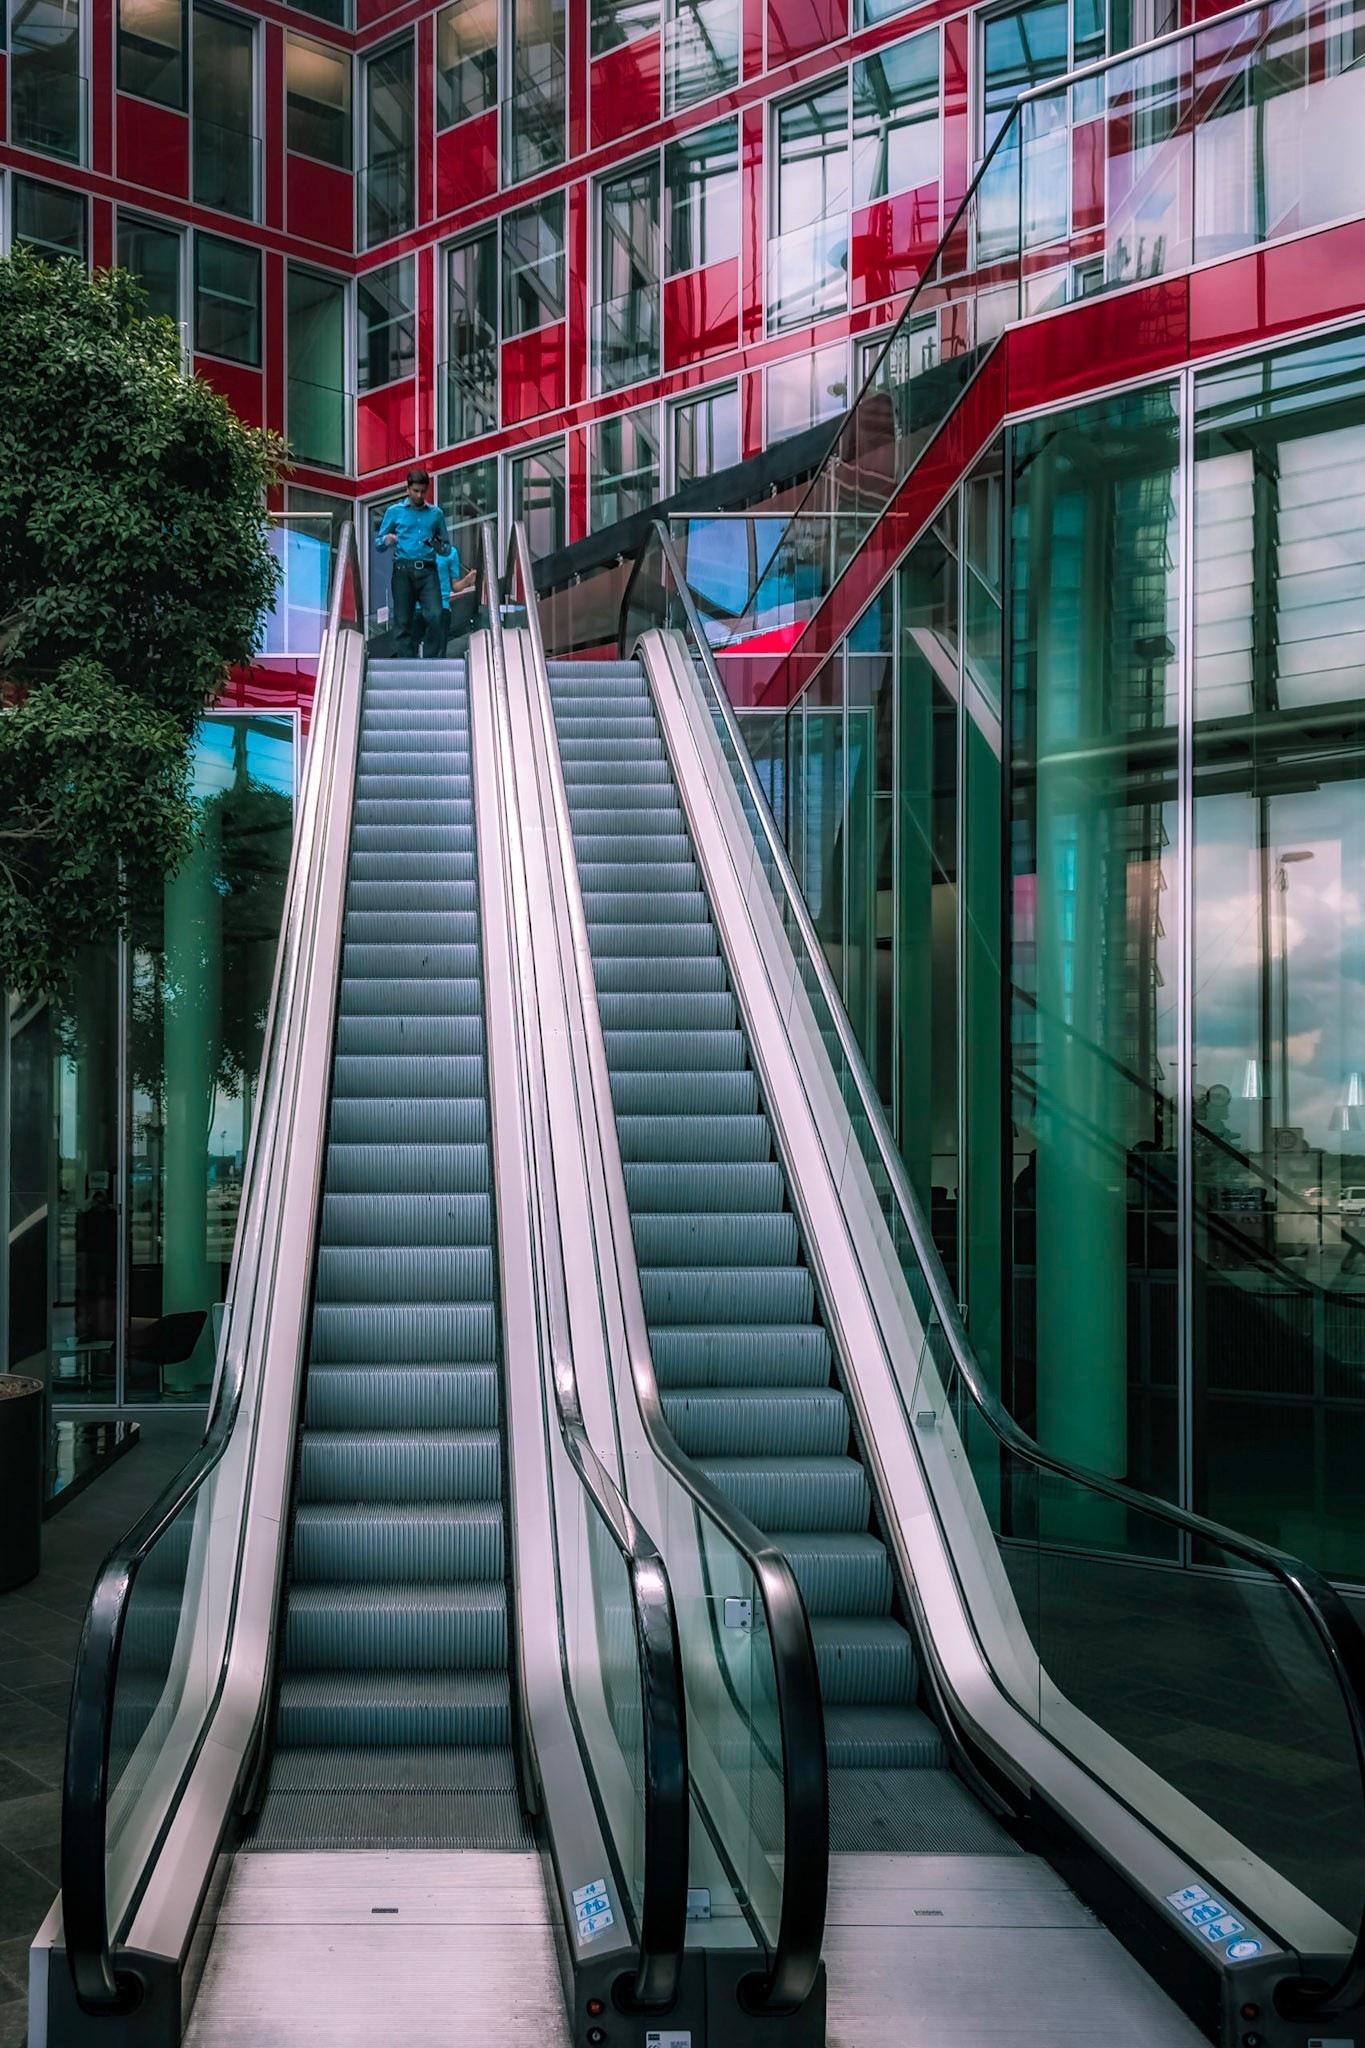 Escalator  by Rob Menting